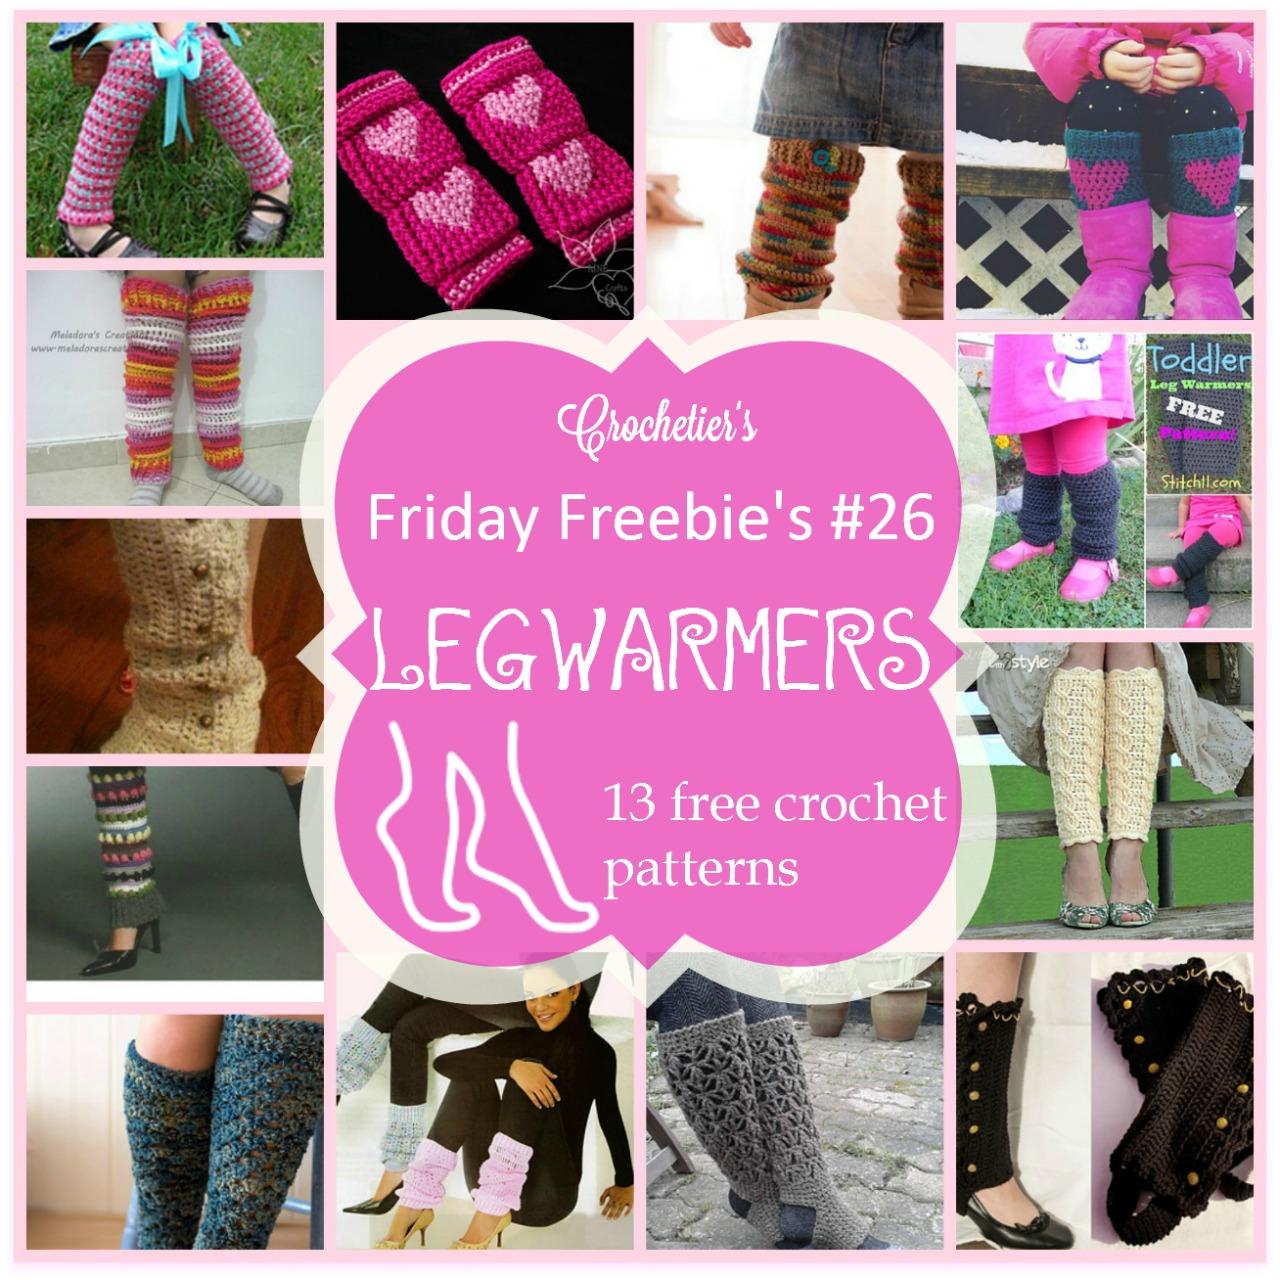 Friday freebies 26 legwarmers crochetier friday freebies 26 legwarmers legwarmerscollagefinished bankloansurffo Choice Image